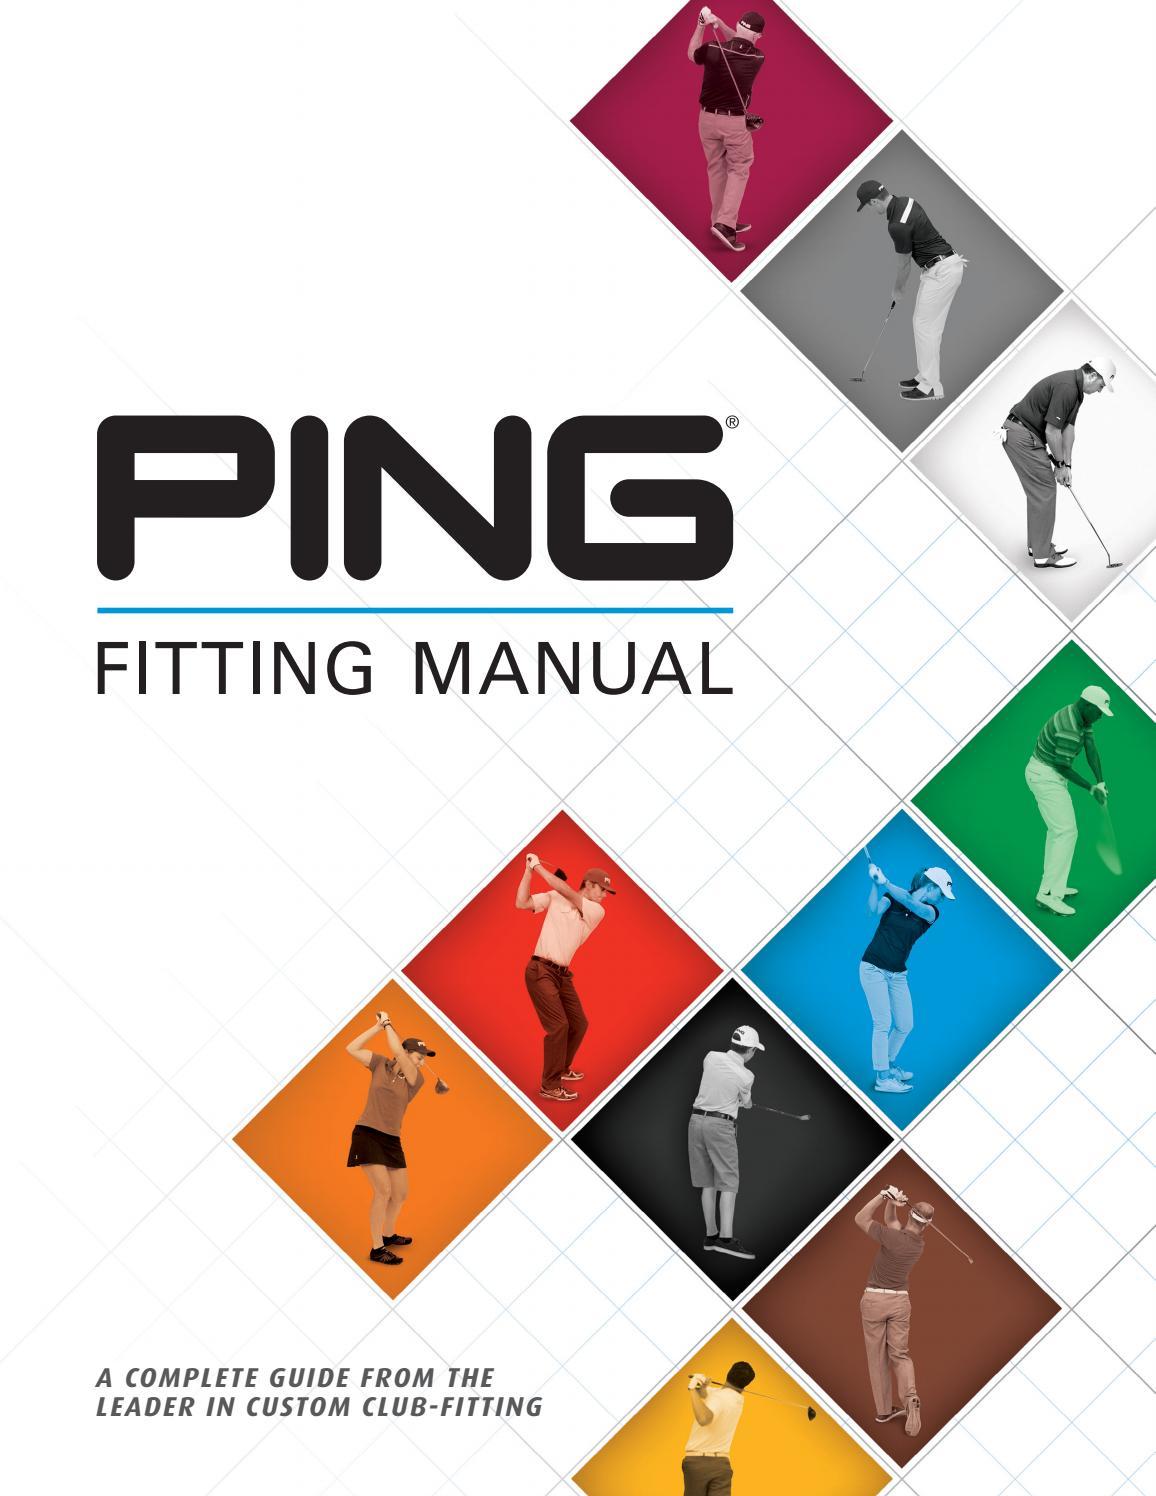 Ping fitting manual 2017 by ping europe ltd issuu nvjuhfo Gallery